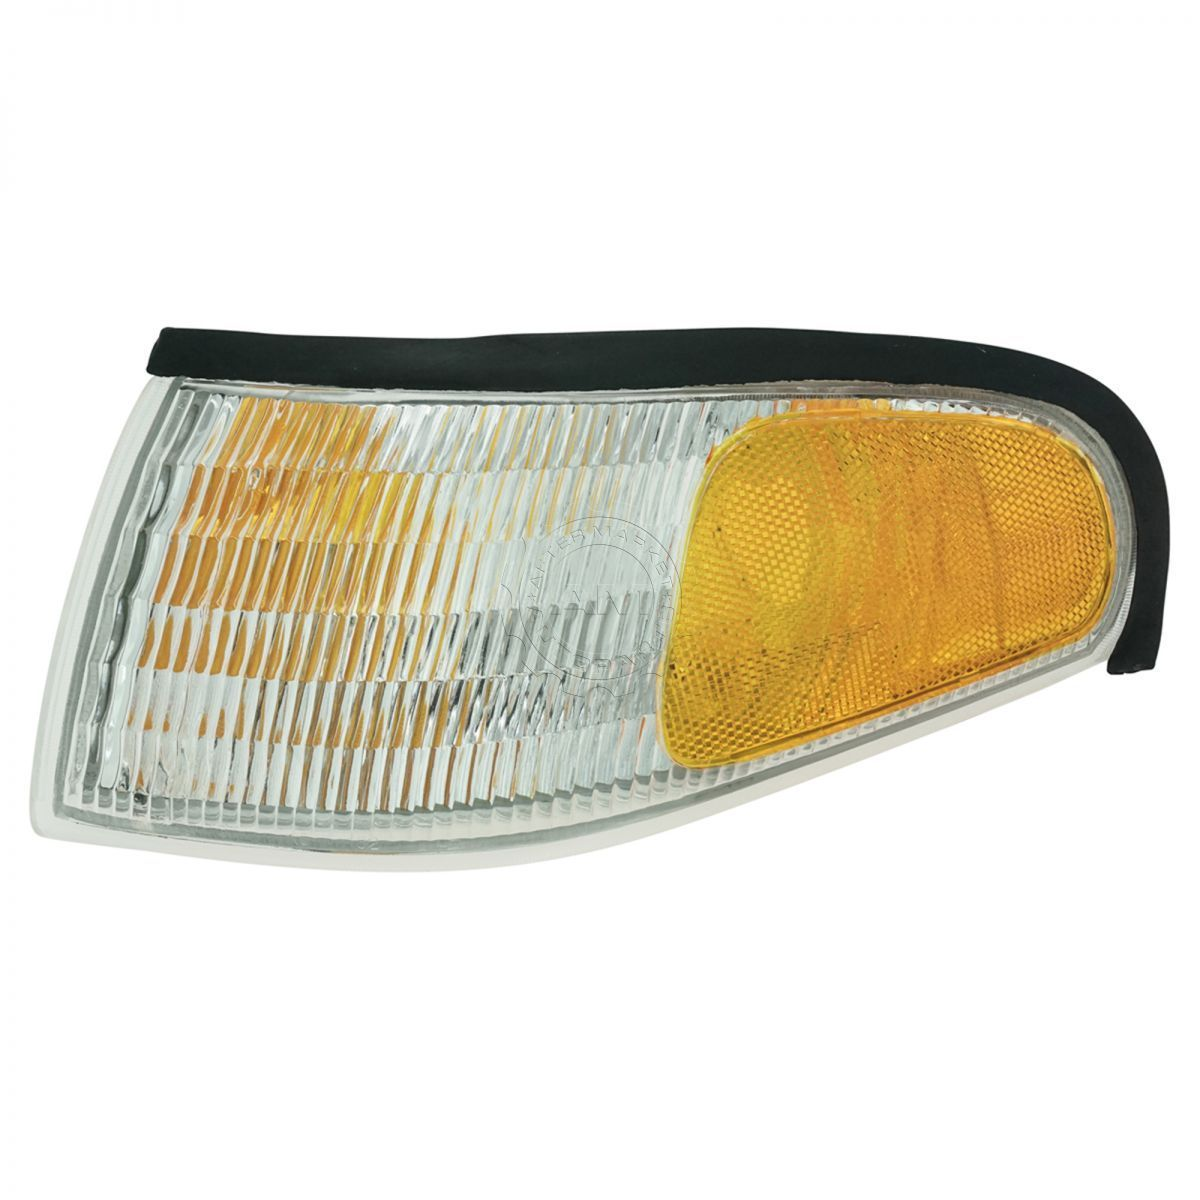 New Passengers Park Signal Side Marker Light Lamp 95-05 Chevy Astro GMC Safari